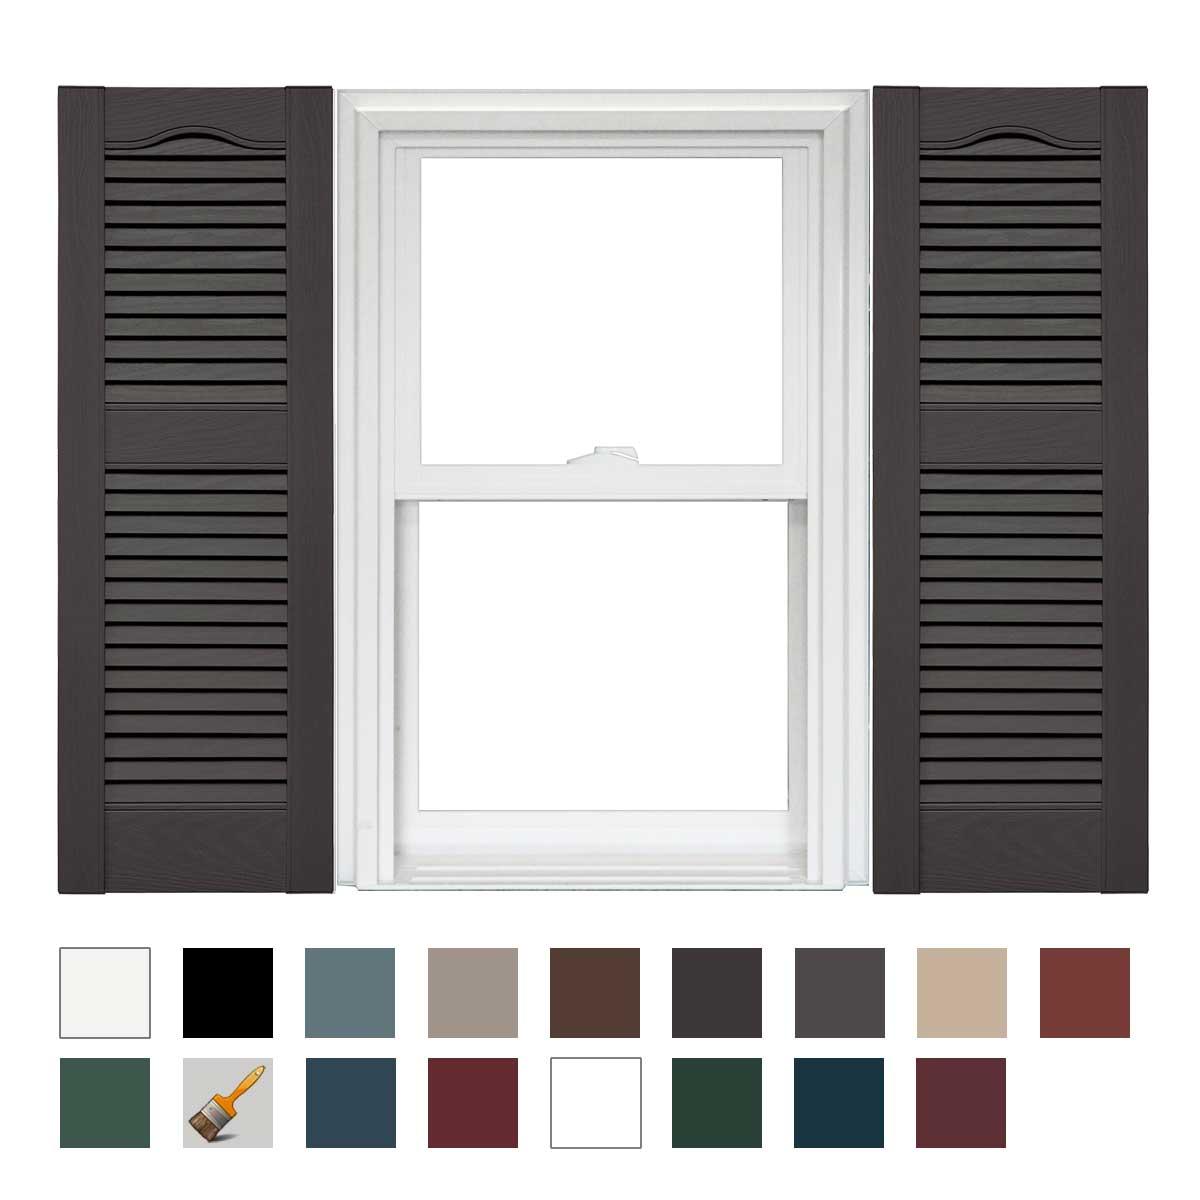 14.5 x 48 018 Tuxedo Gray